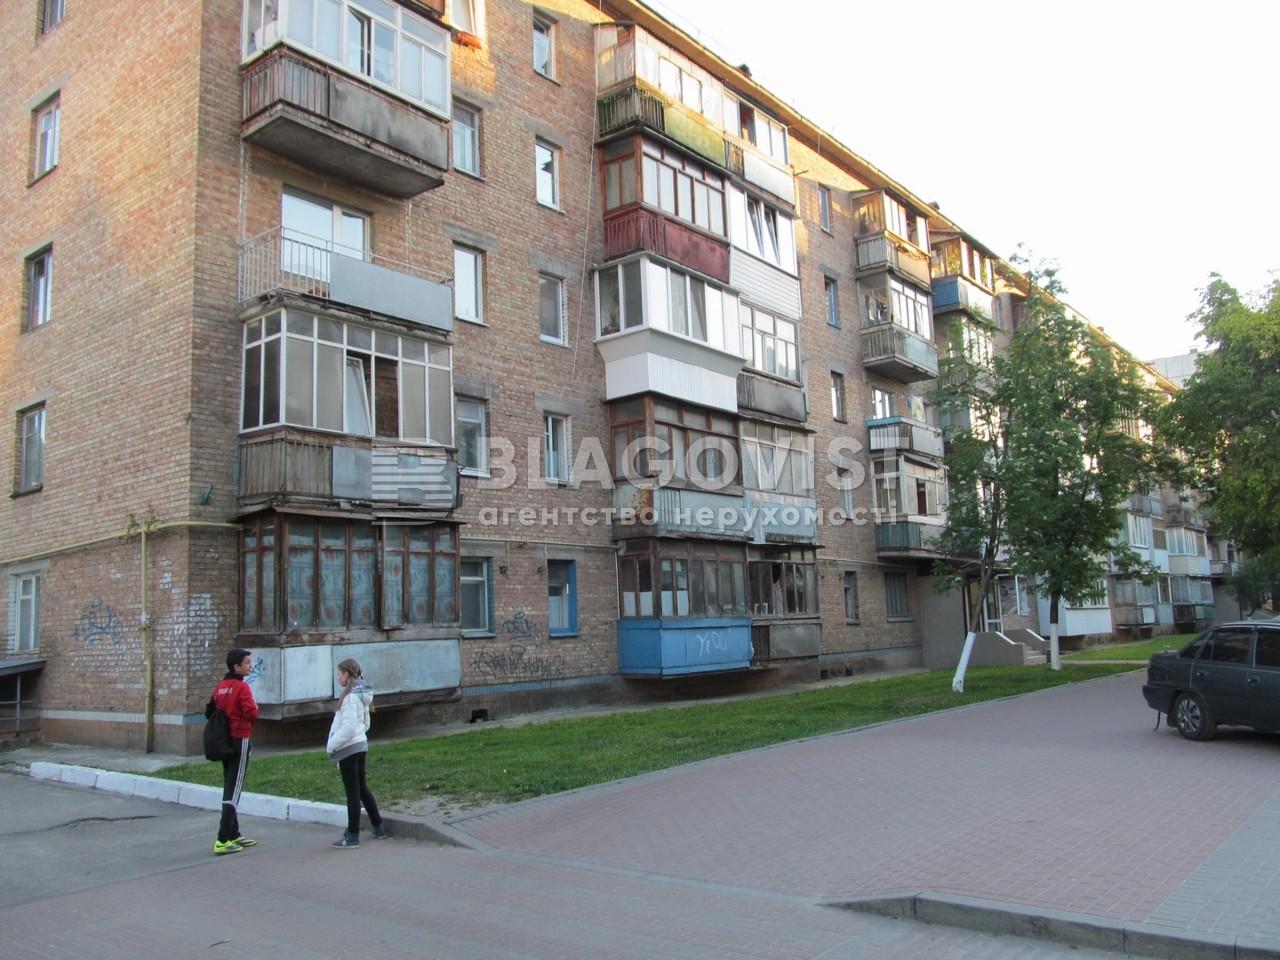 Квартира E-32222, Октябрьская, 8, Вишневое (Киево-Святошинский) - Фото 1